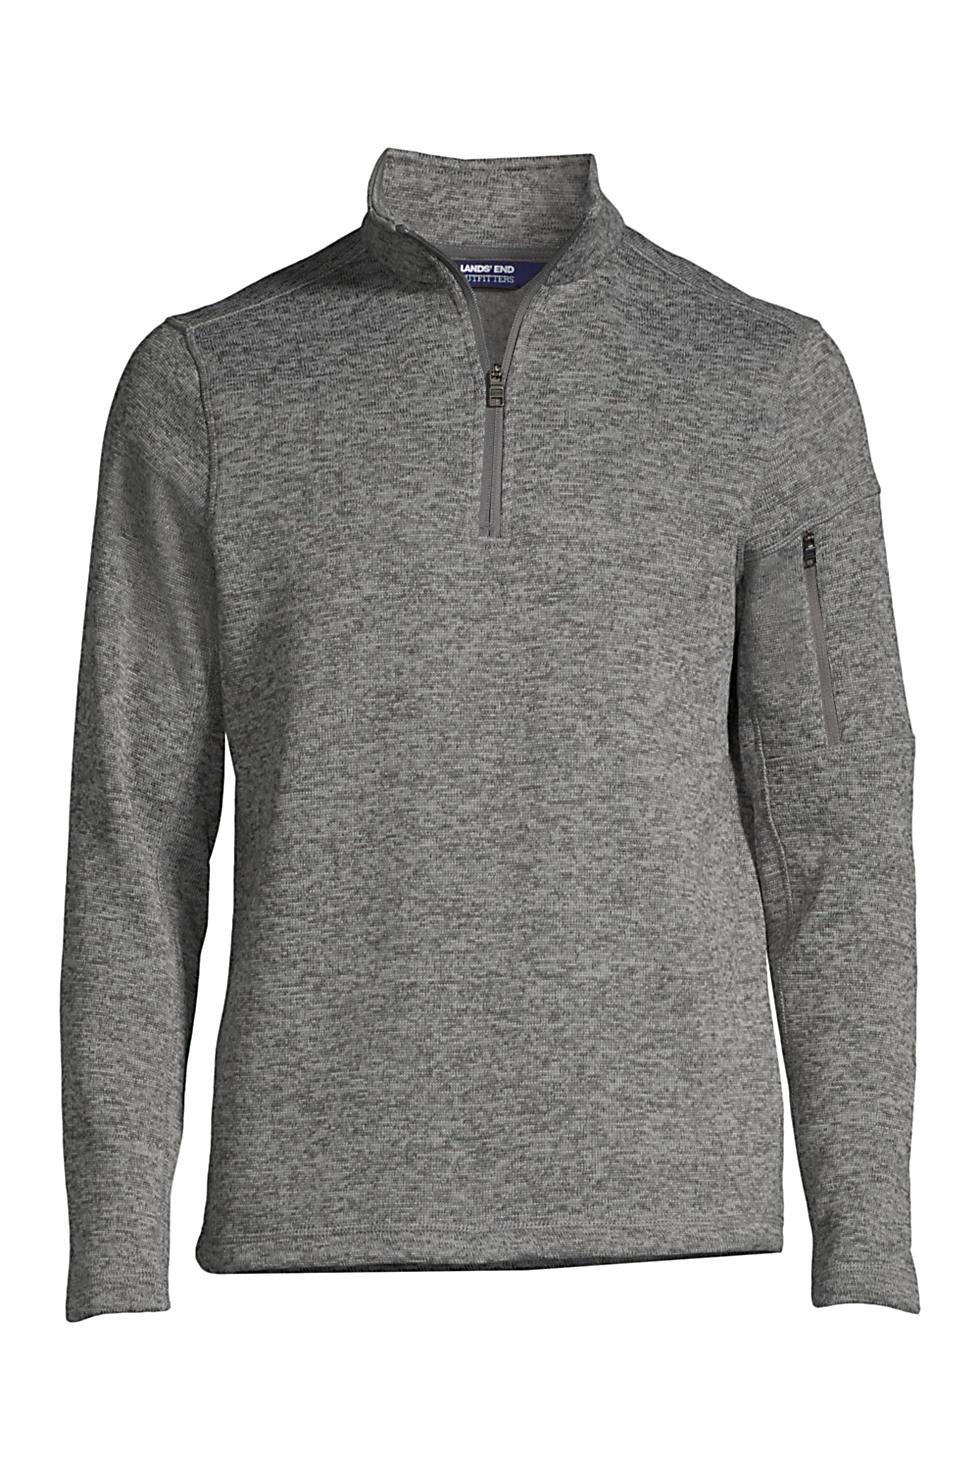 Lands End Mens Sweater Fleece Quarter Zip Pullover (various colors/sizes)